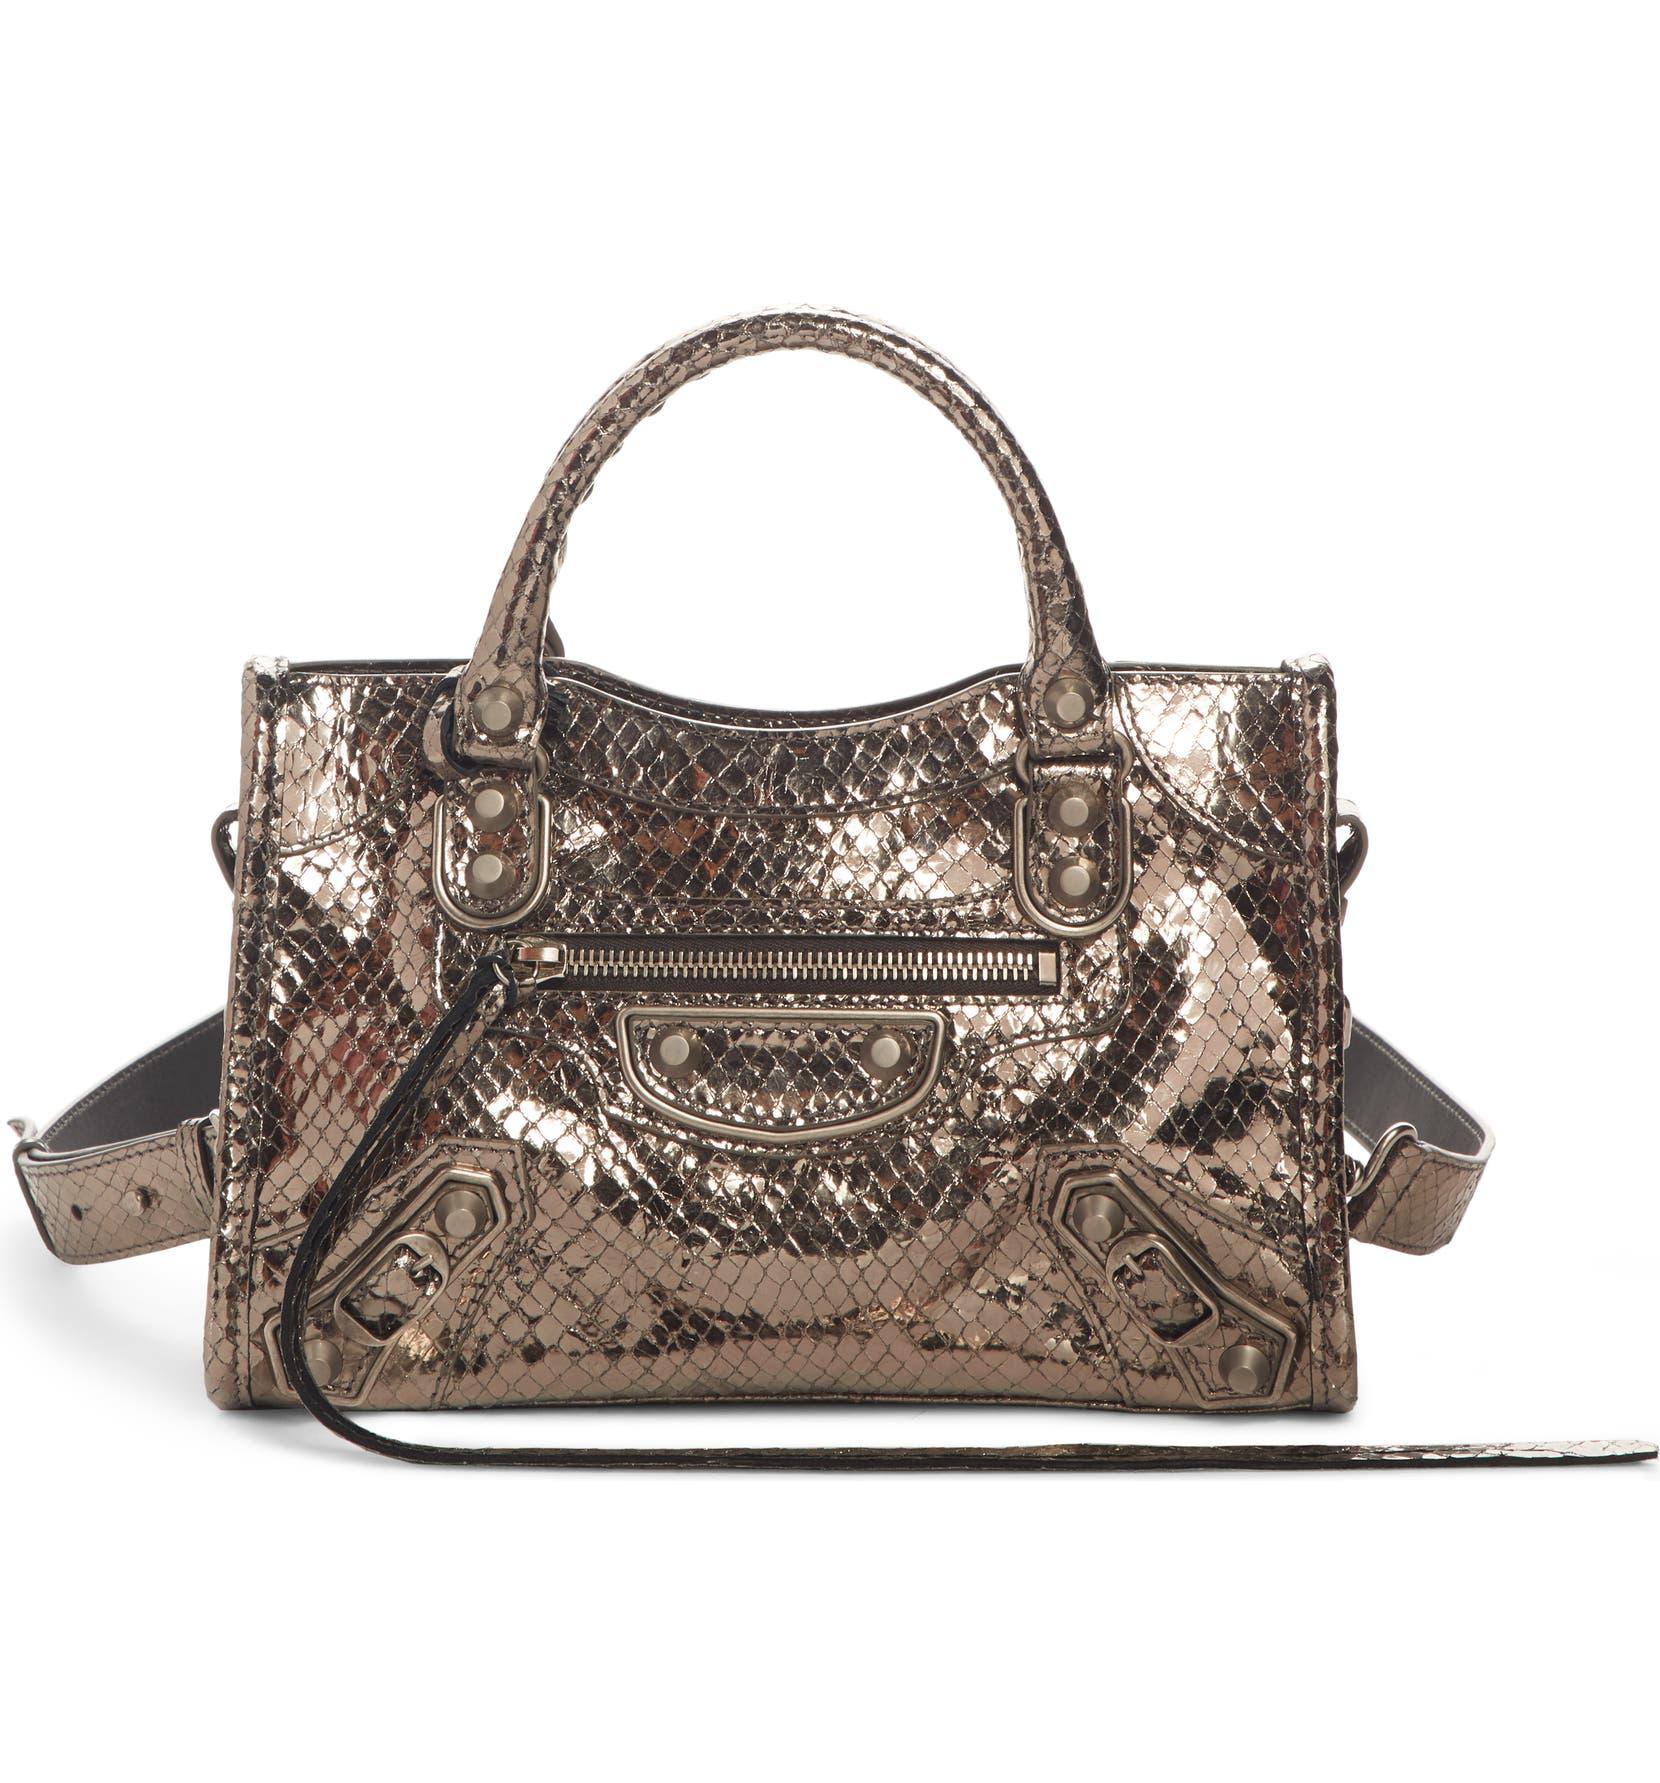 f7087aeed1 Balenciaga Metallic Mini City Croc Embossed Leather Bag